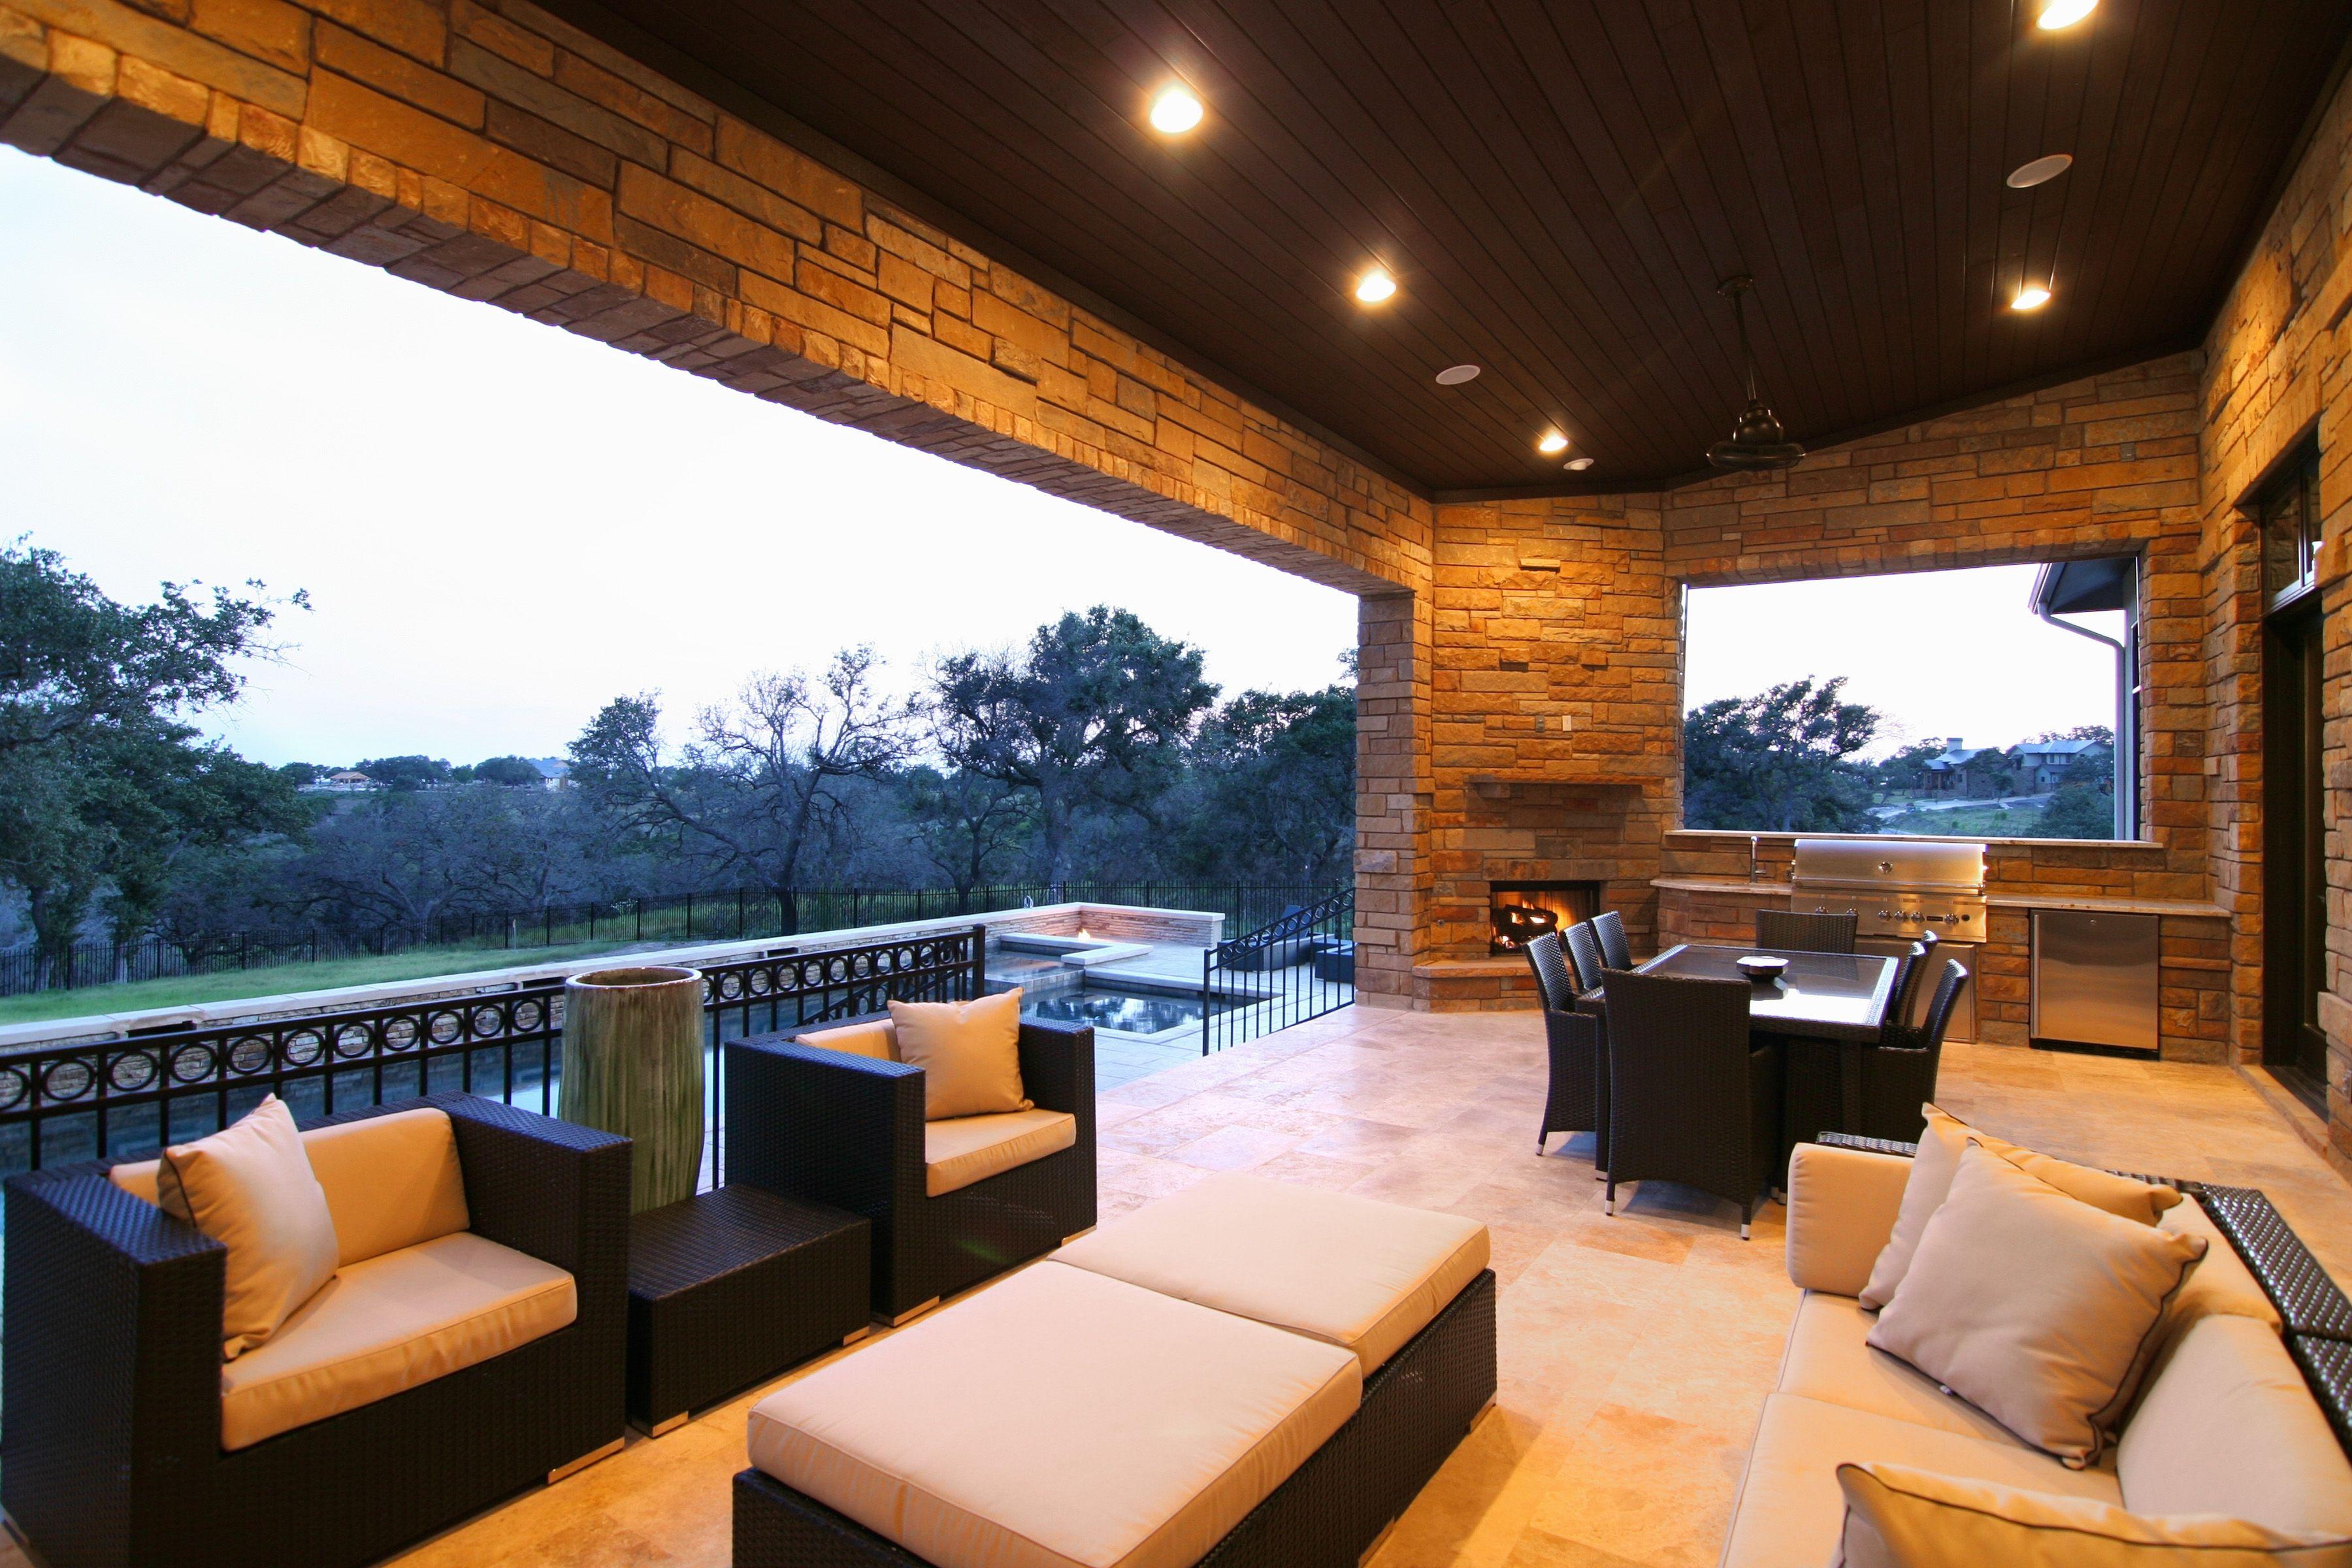 Bedroom Furniture Stores Austin Tx Exterior Decoration austin luxury home builders archives - zbranek & holt | patios